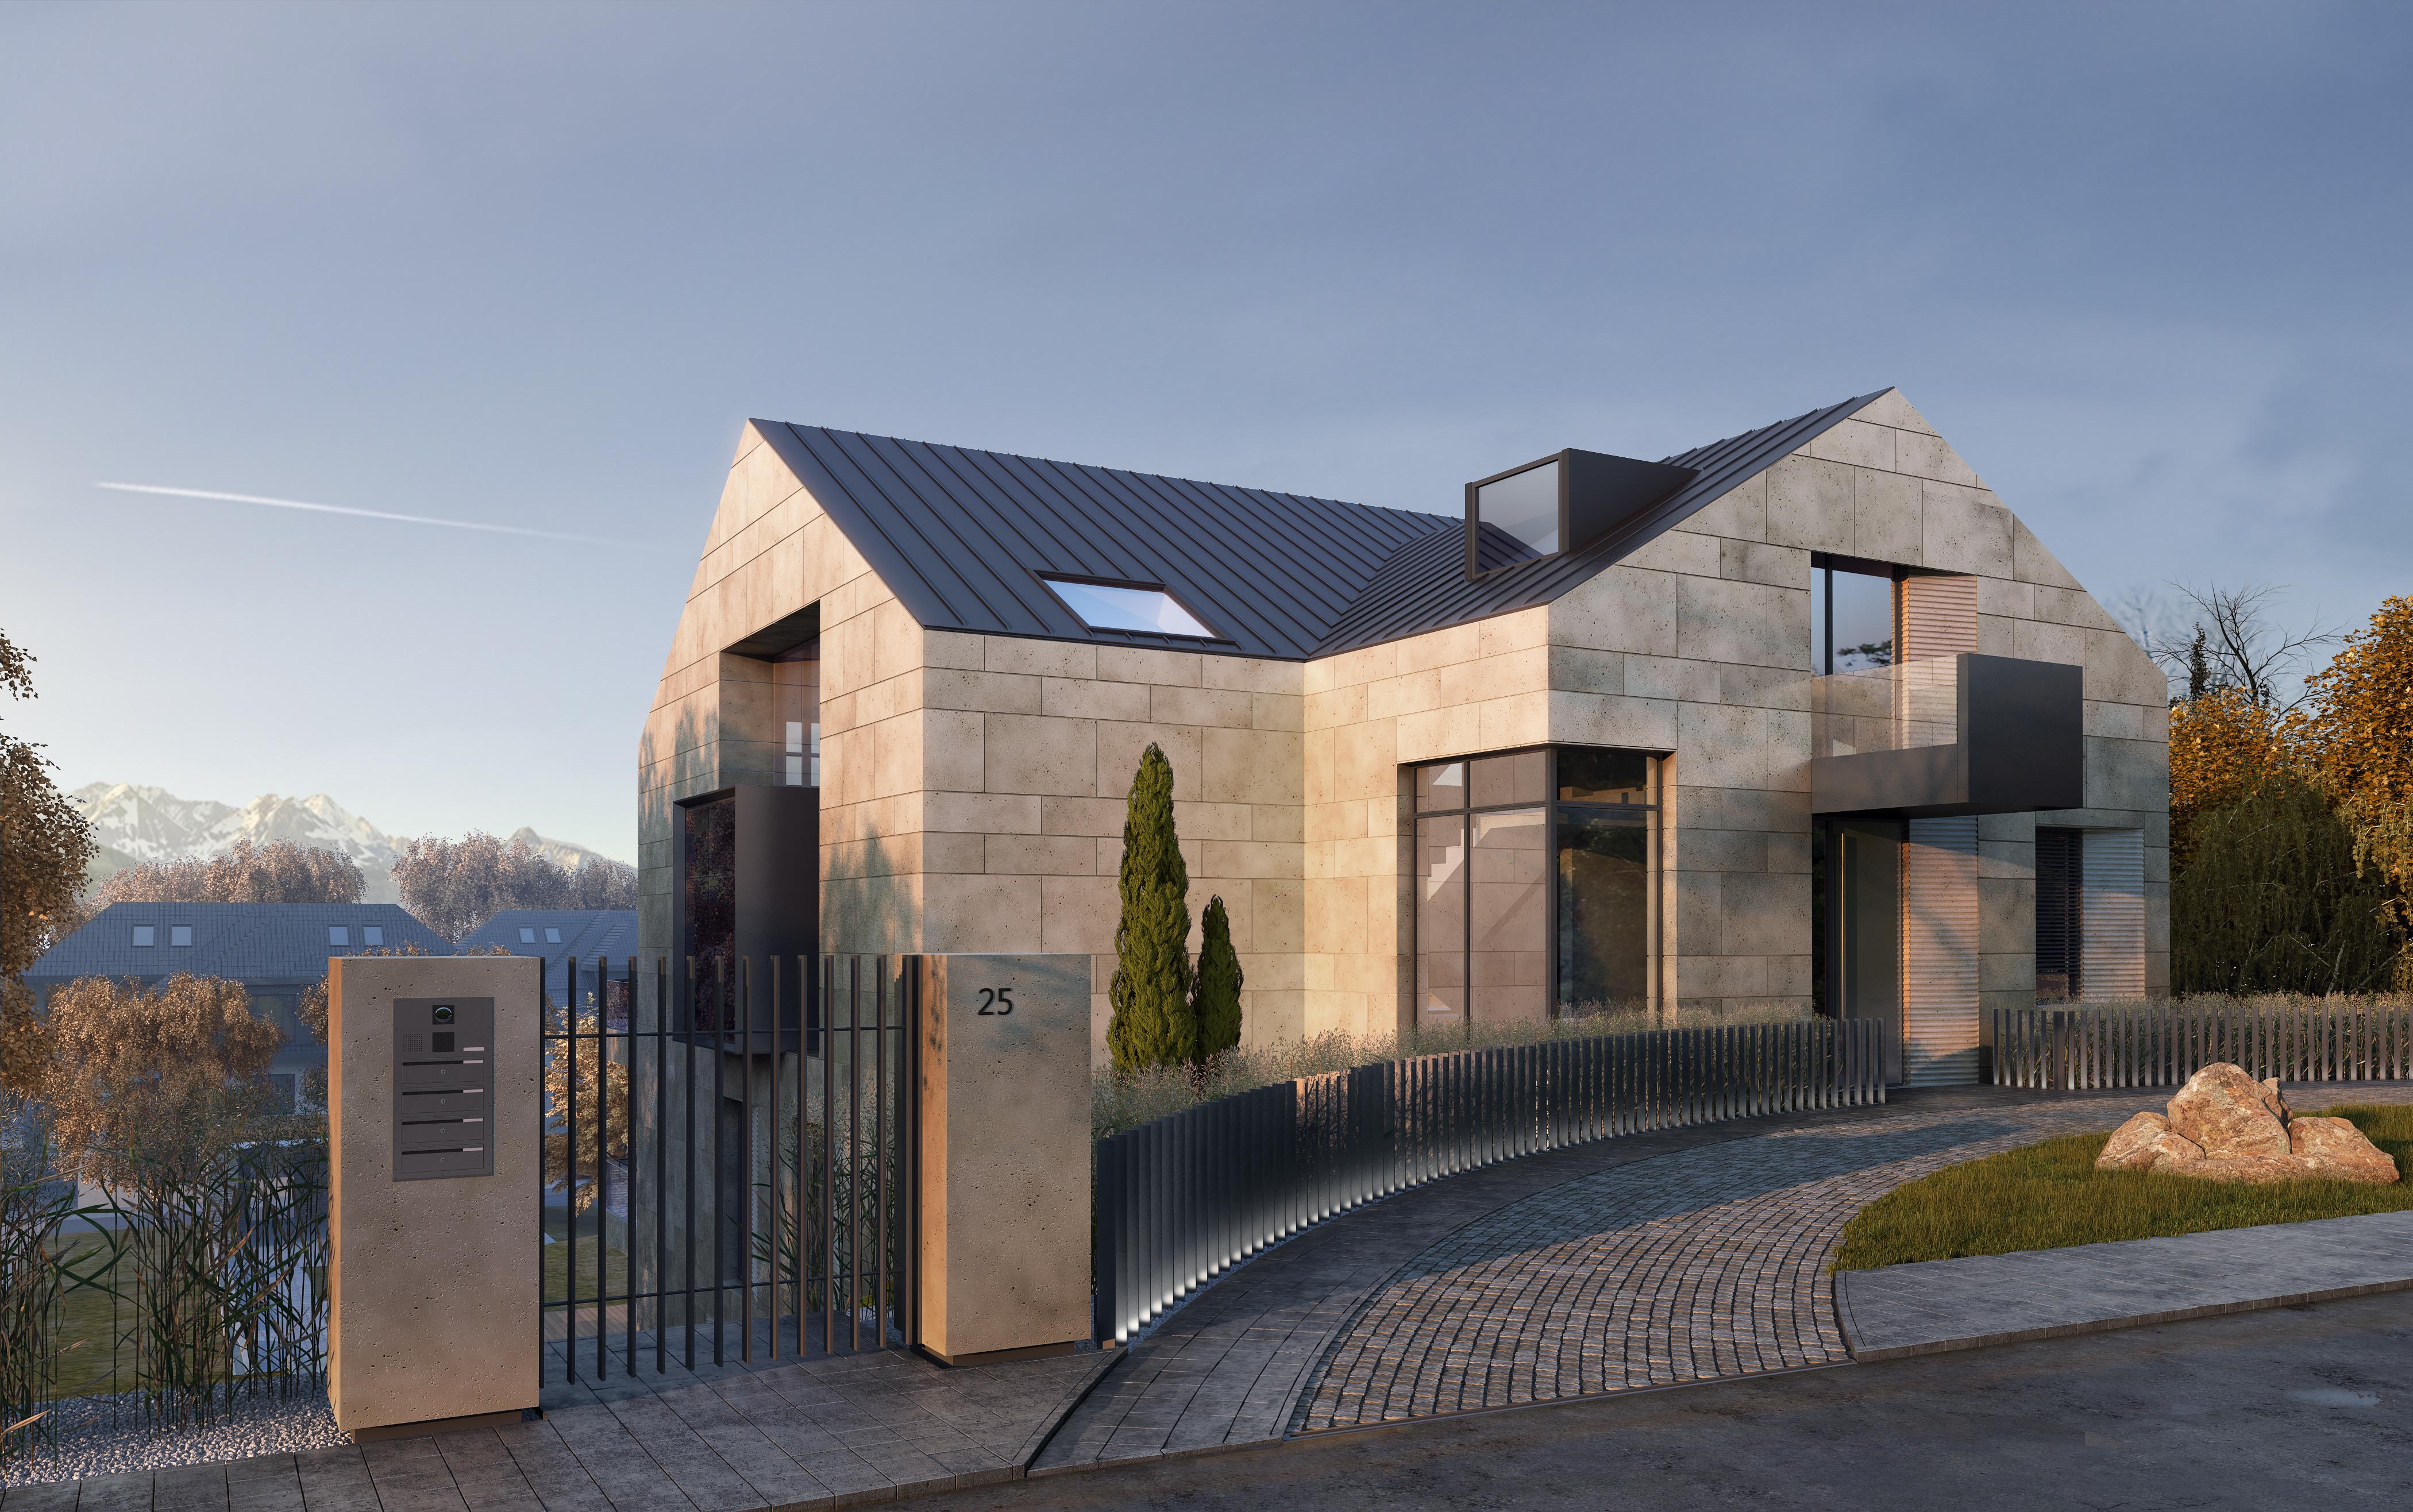 luxusvilla am starnberger see bps planung. Black Bedroom Furniture Sets. Home Design Ideas